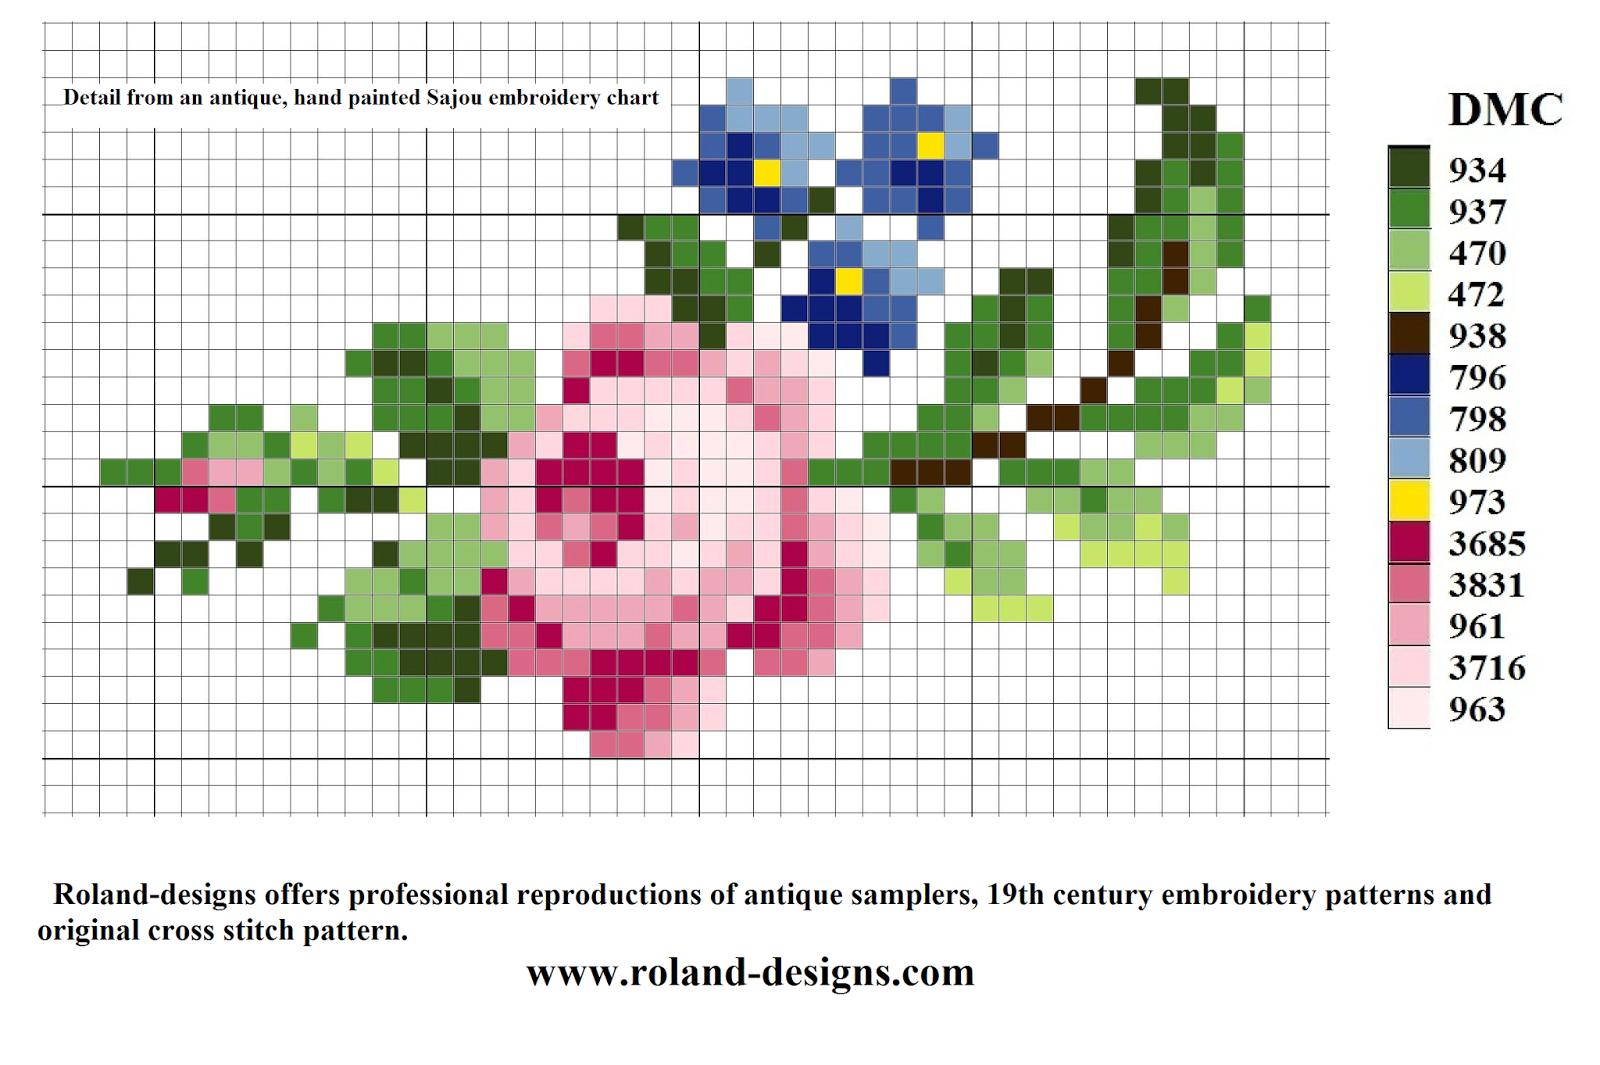 Knitting Cross Stitch Pattern : Roland-designs.: Free cross stitch pattern + Emilies knitting